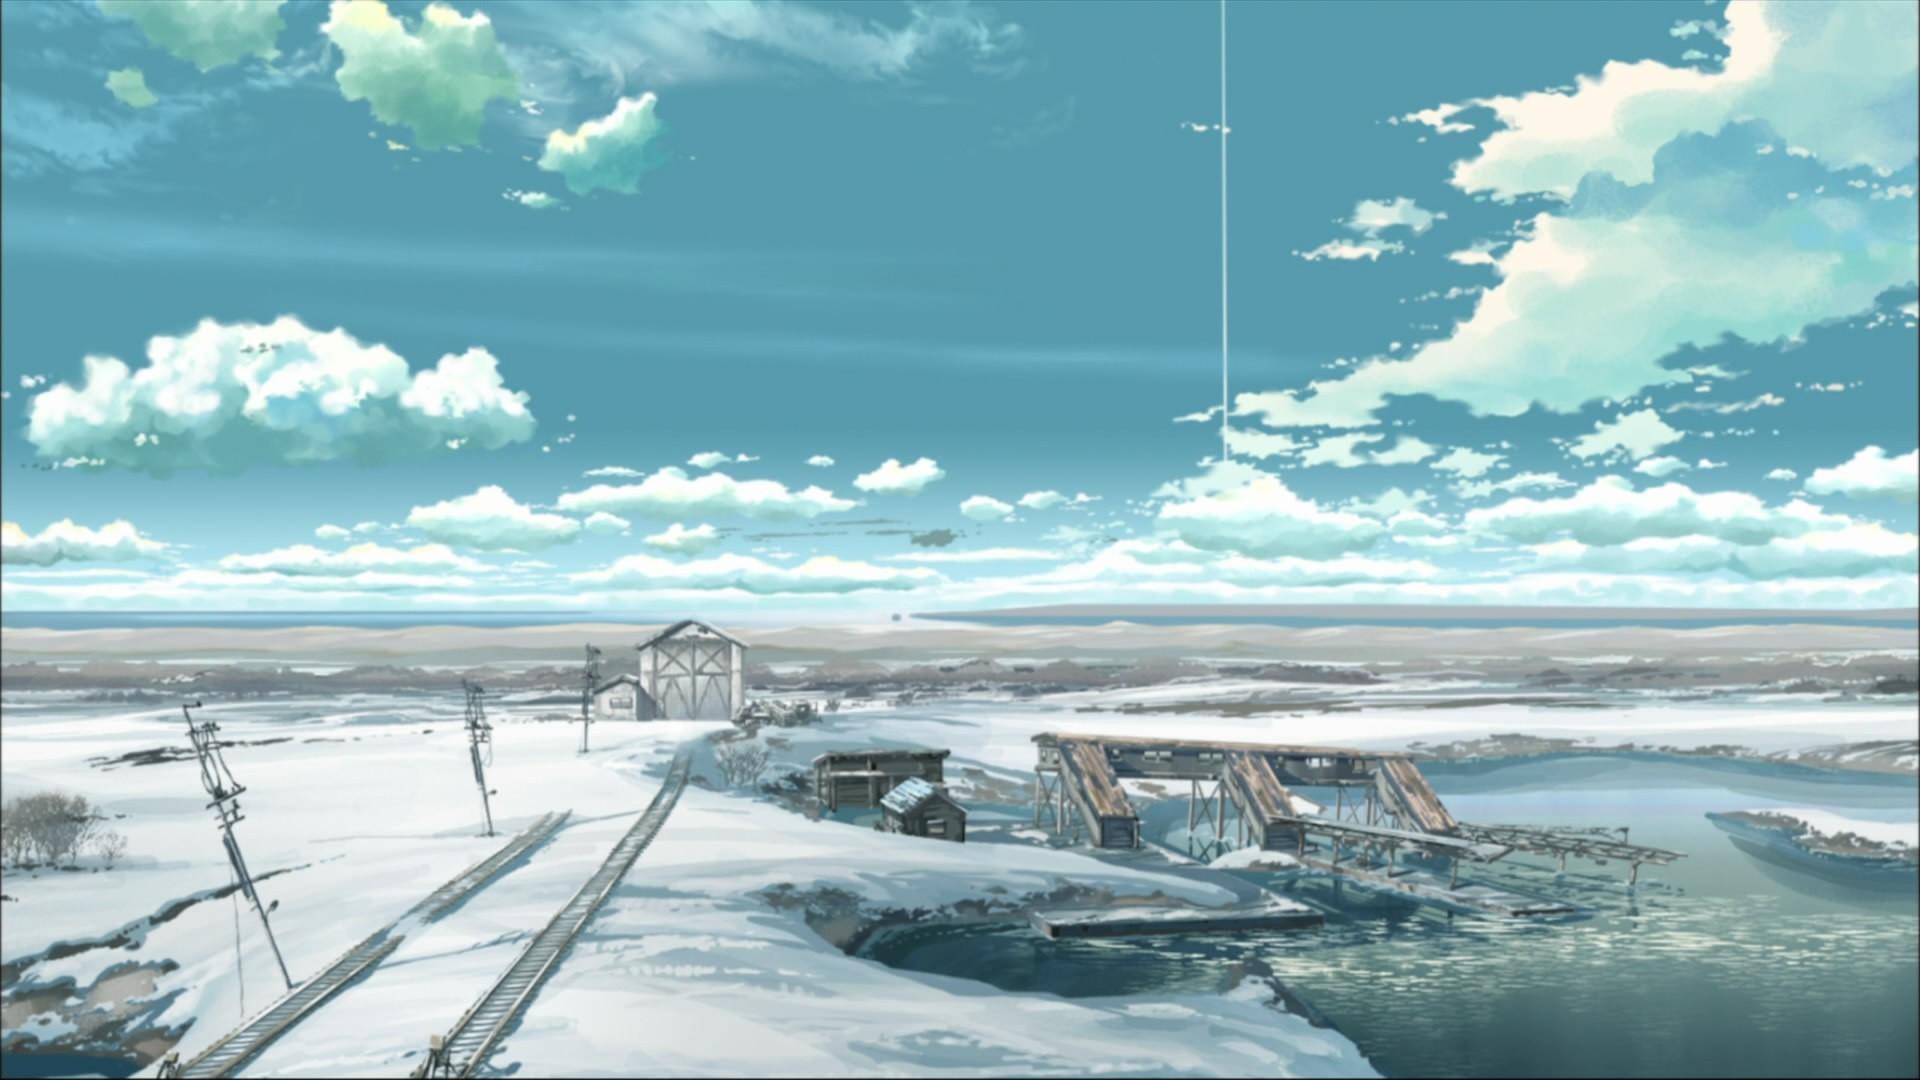 3d Graffiti Wallpaper 1080 Anime Landscape Wallpaper Hd Pixelstalk Net